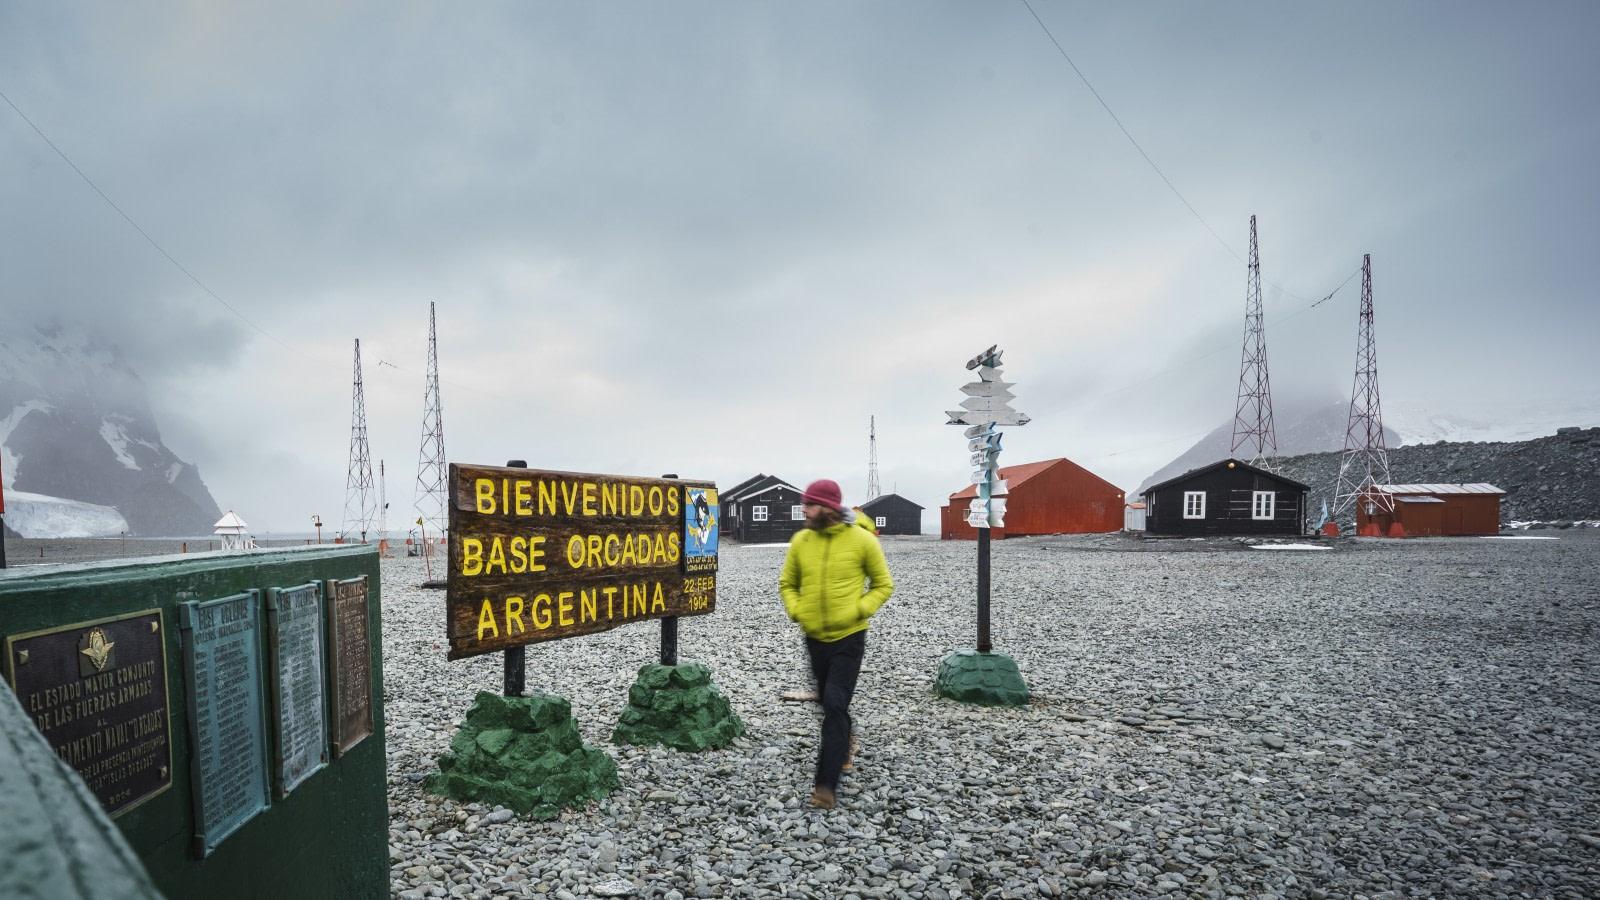 Orcadas Station auf den Süd-Orkneyinseln